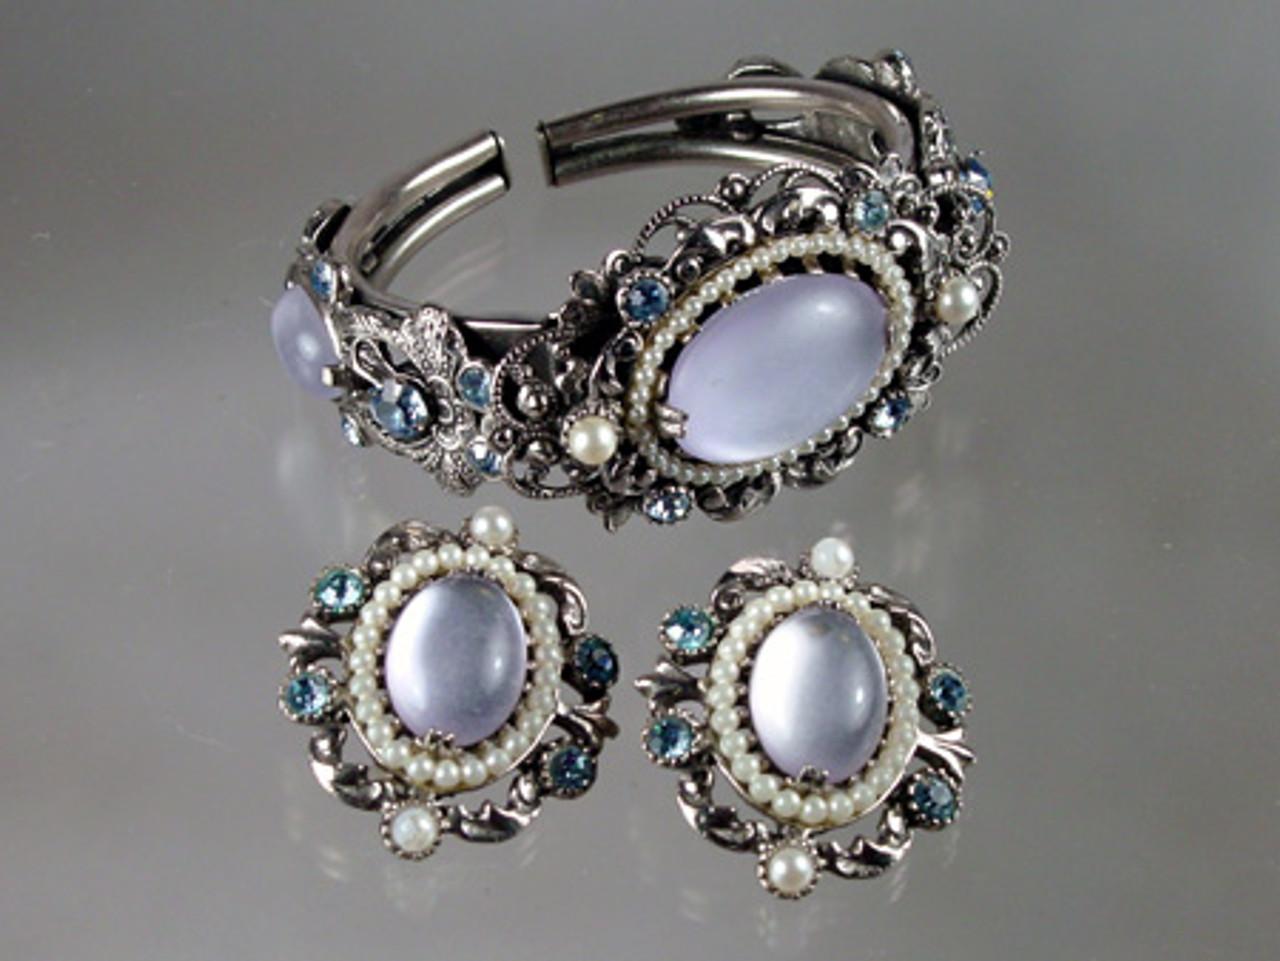 Faux moonstone Selro Corp bracelet and earrings set